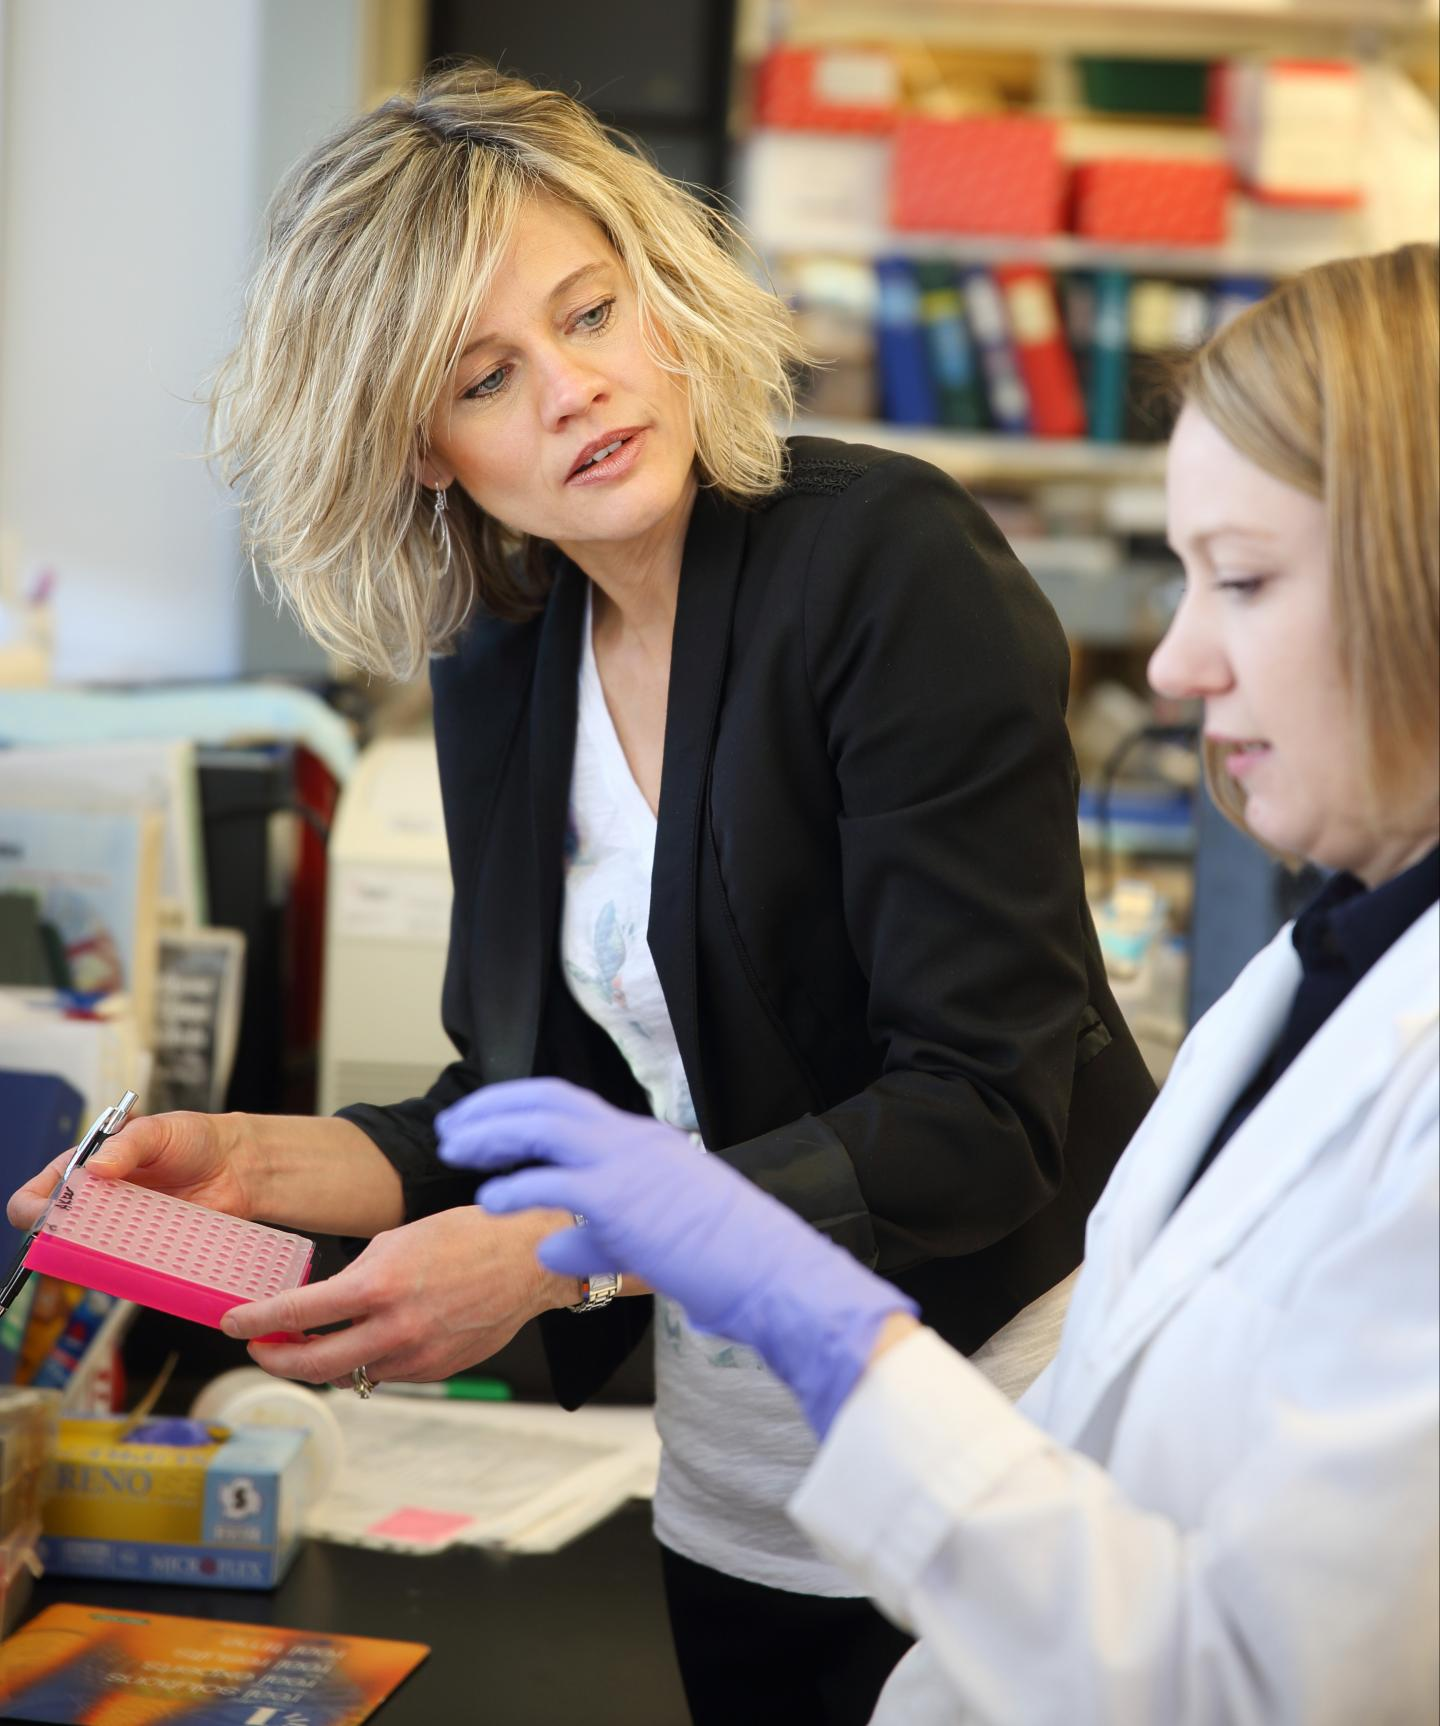 New Study on Children Shows Fiber Supplement Changes Gut Bacteria